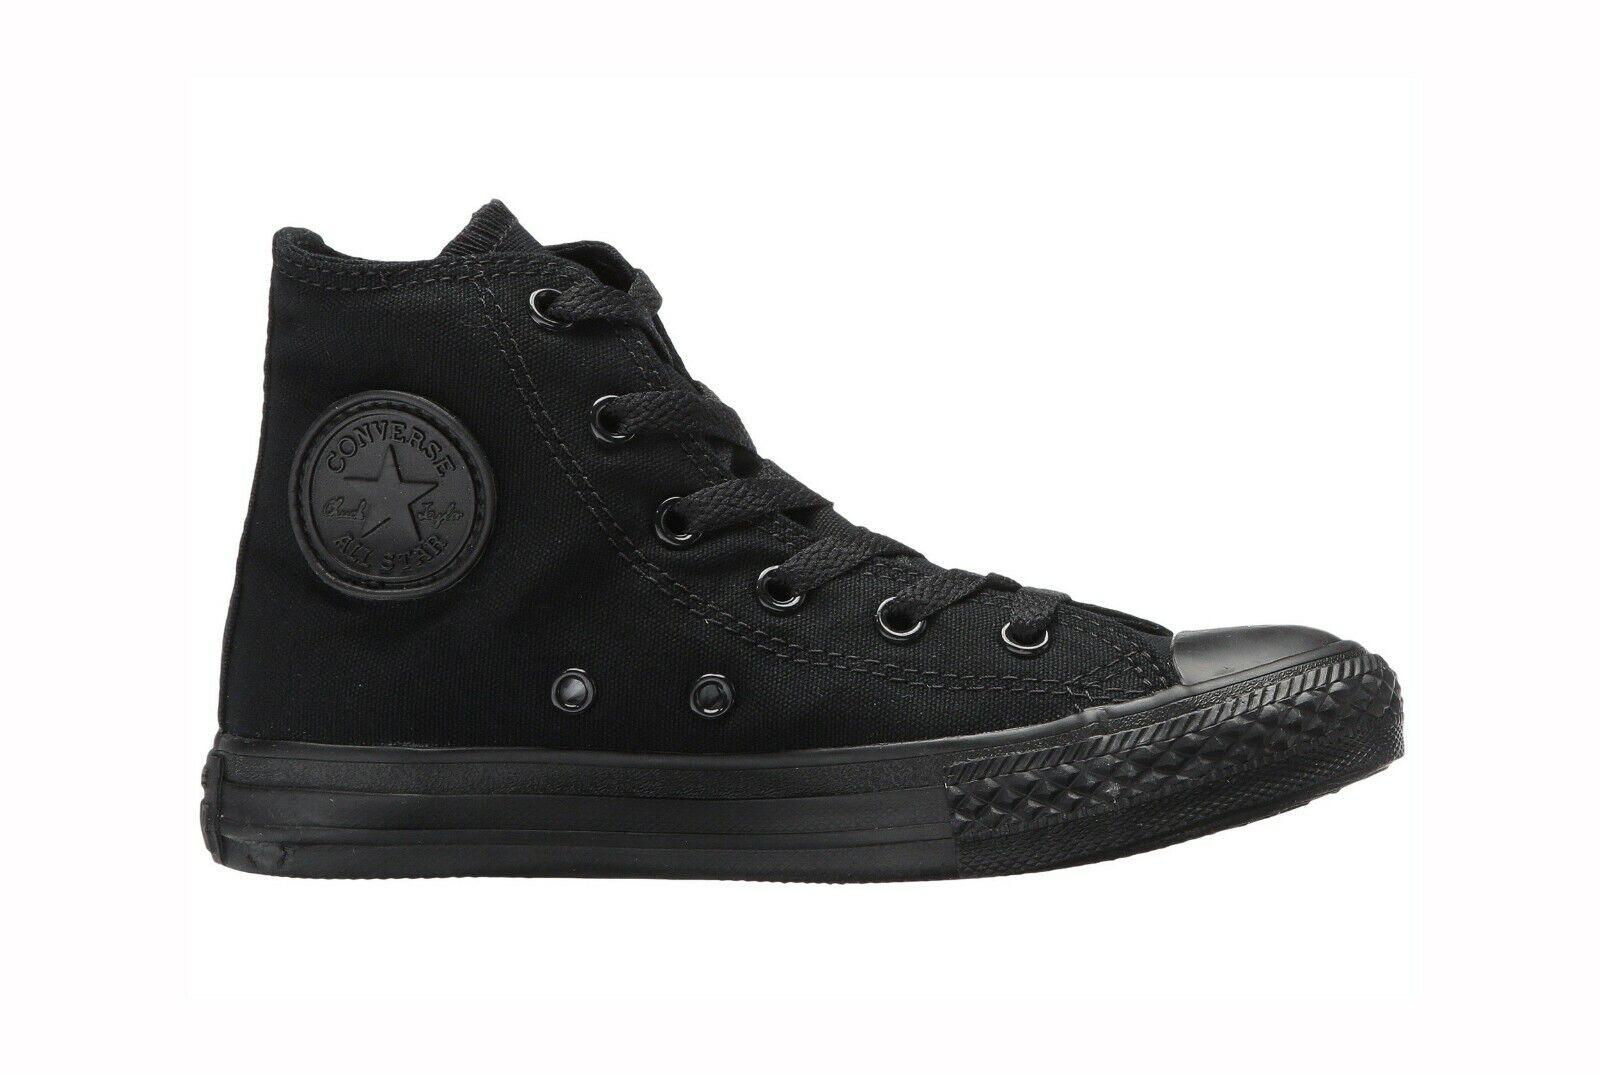 CONVERSE All Star Chuck Taylor Hi Top BLACK MONOCH 3S121 KIDS Unisex Sneakers